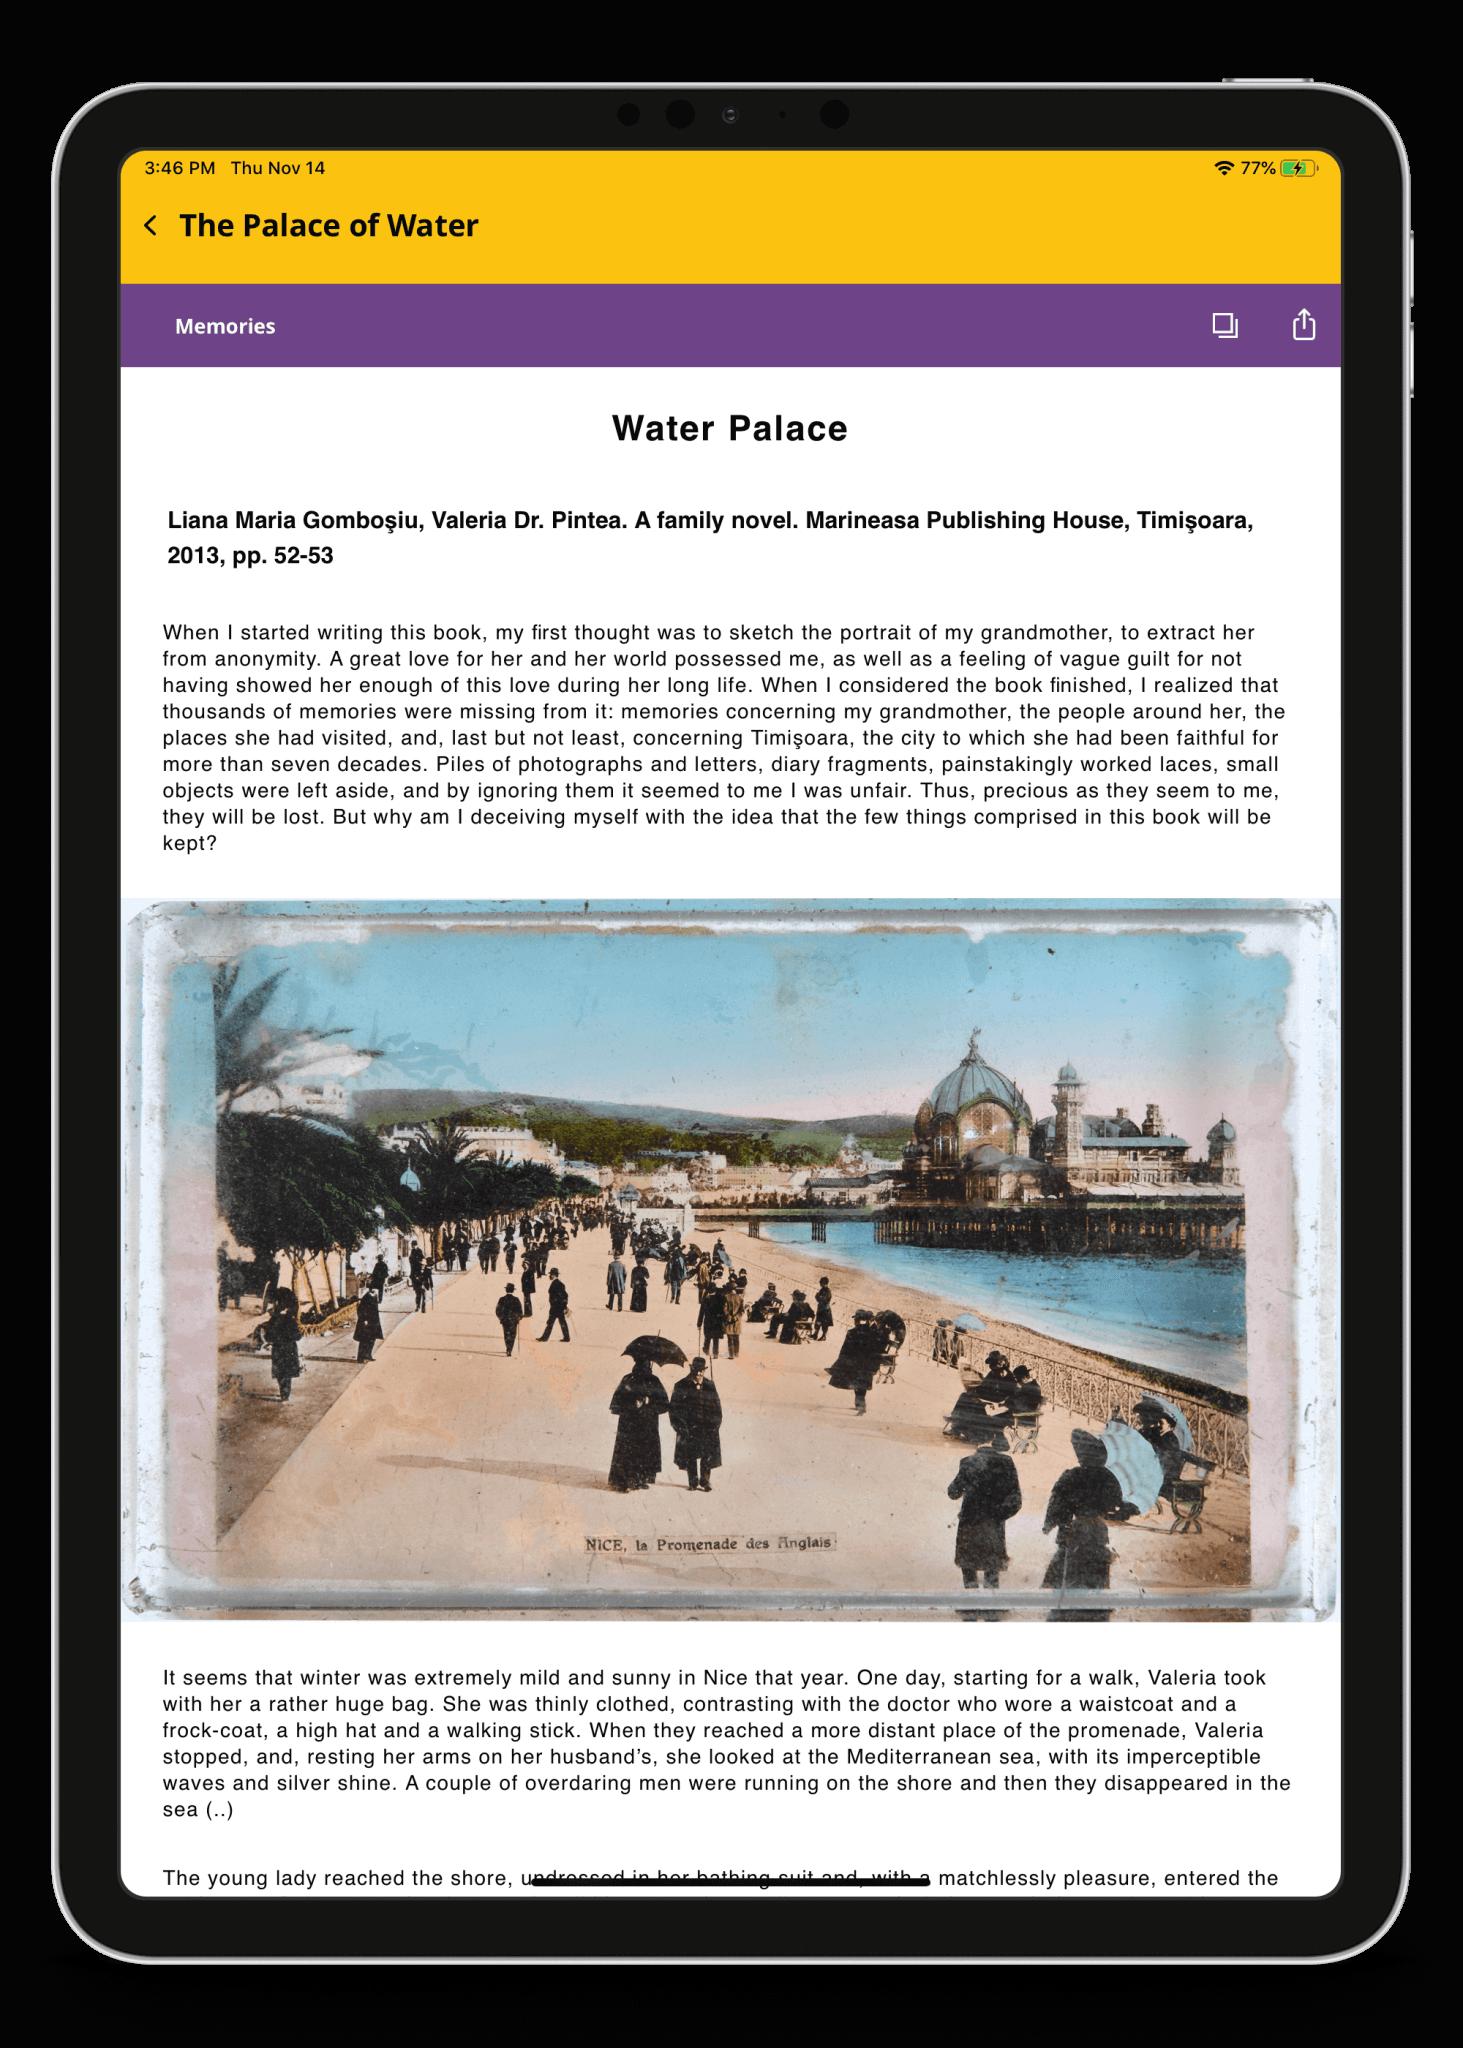 Spotlight-Heritage-ipad-Palace-of-Water1-scaled (1)